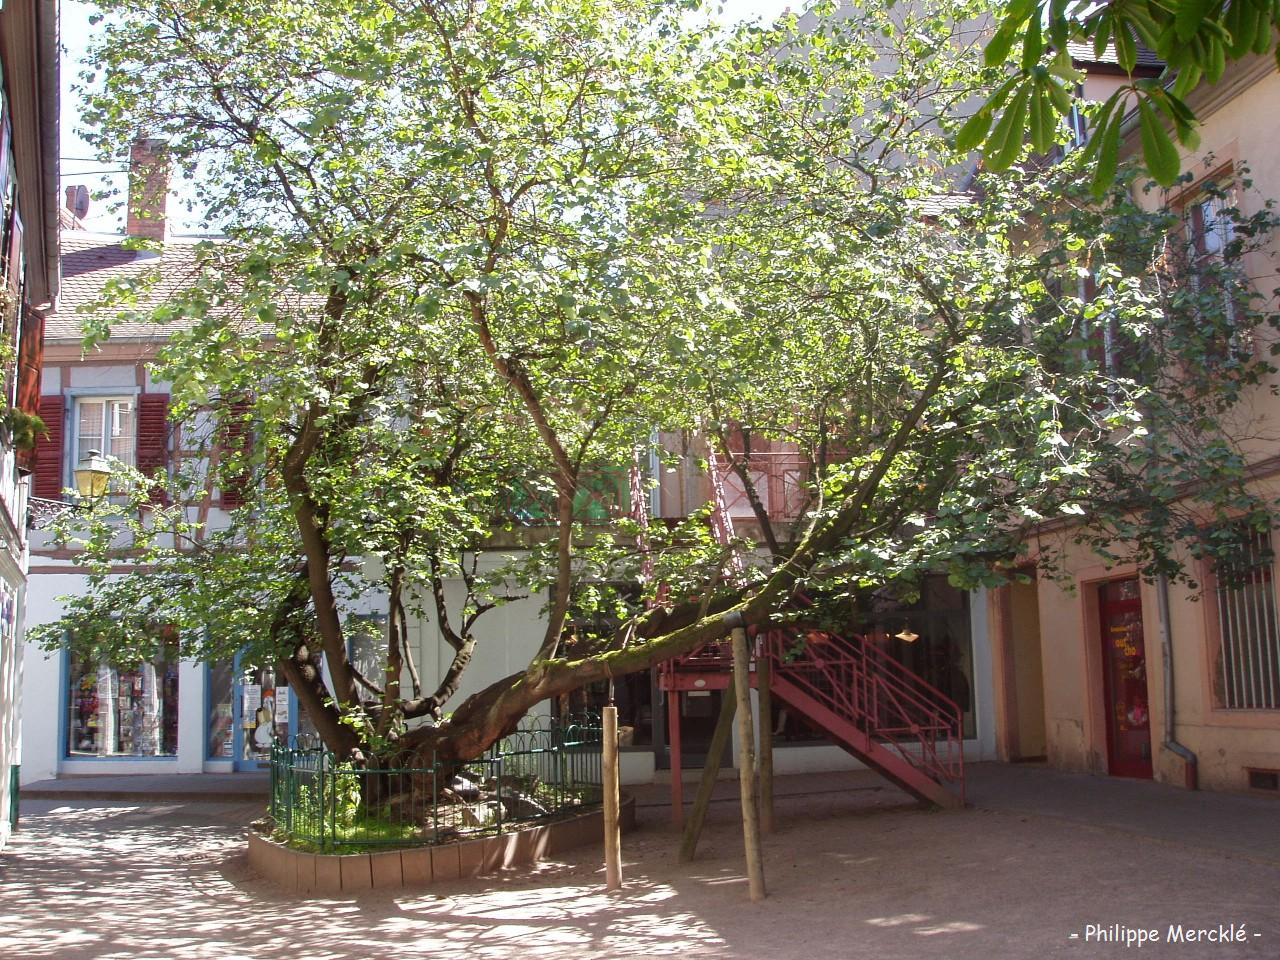 arbre de jud e cour waldner stephan colmar haut rhin krapo arboricole. Black Bedroom Furniture Sets. Home Design Ideas